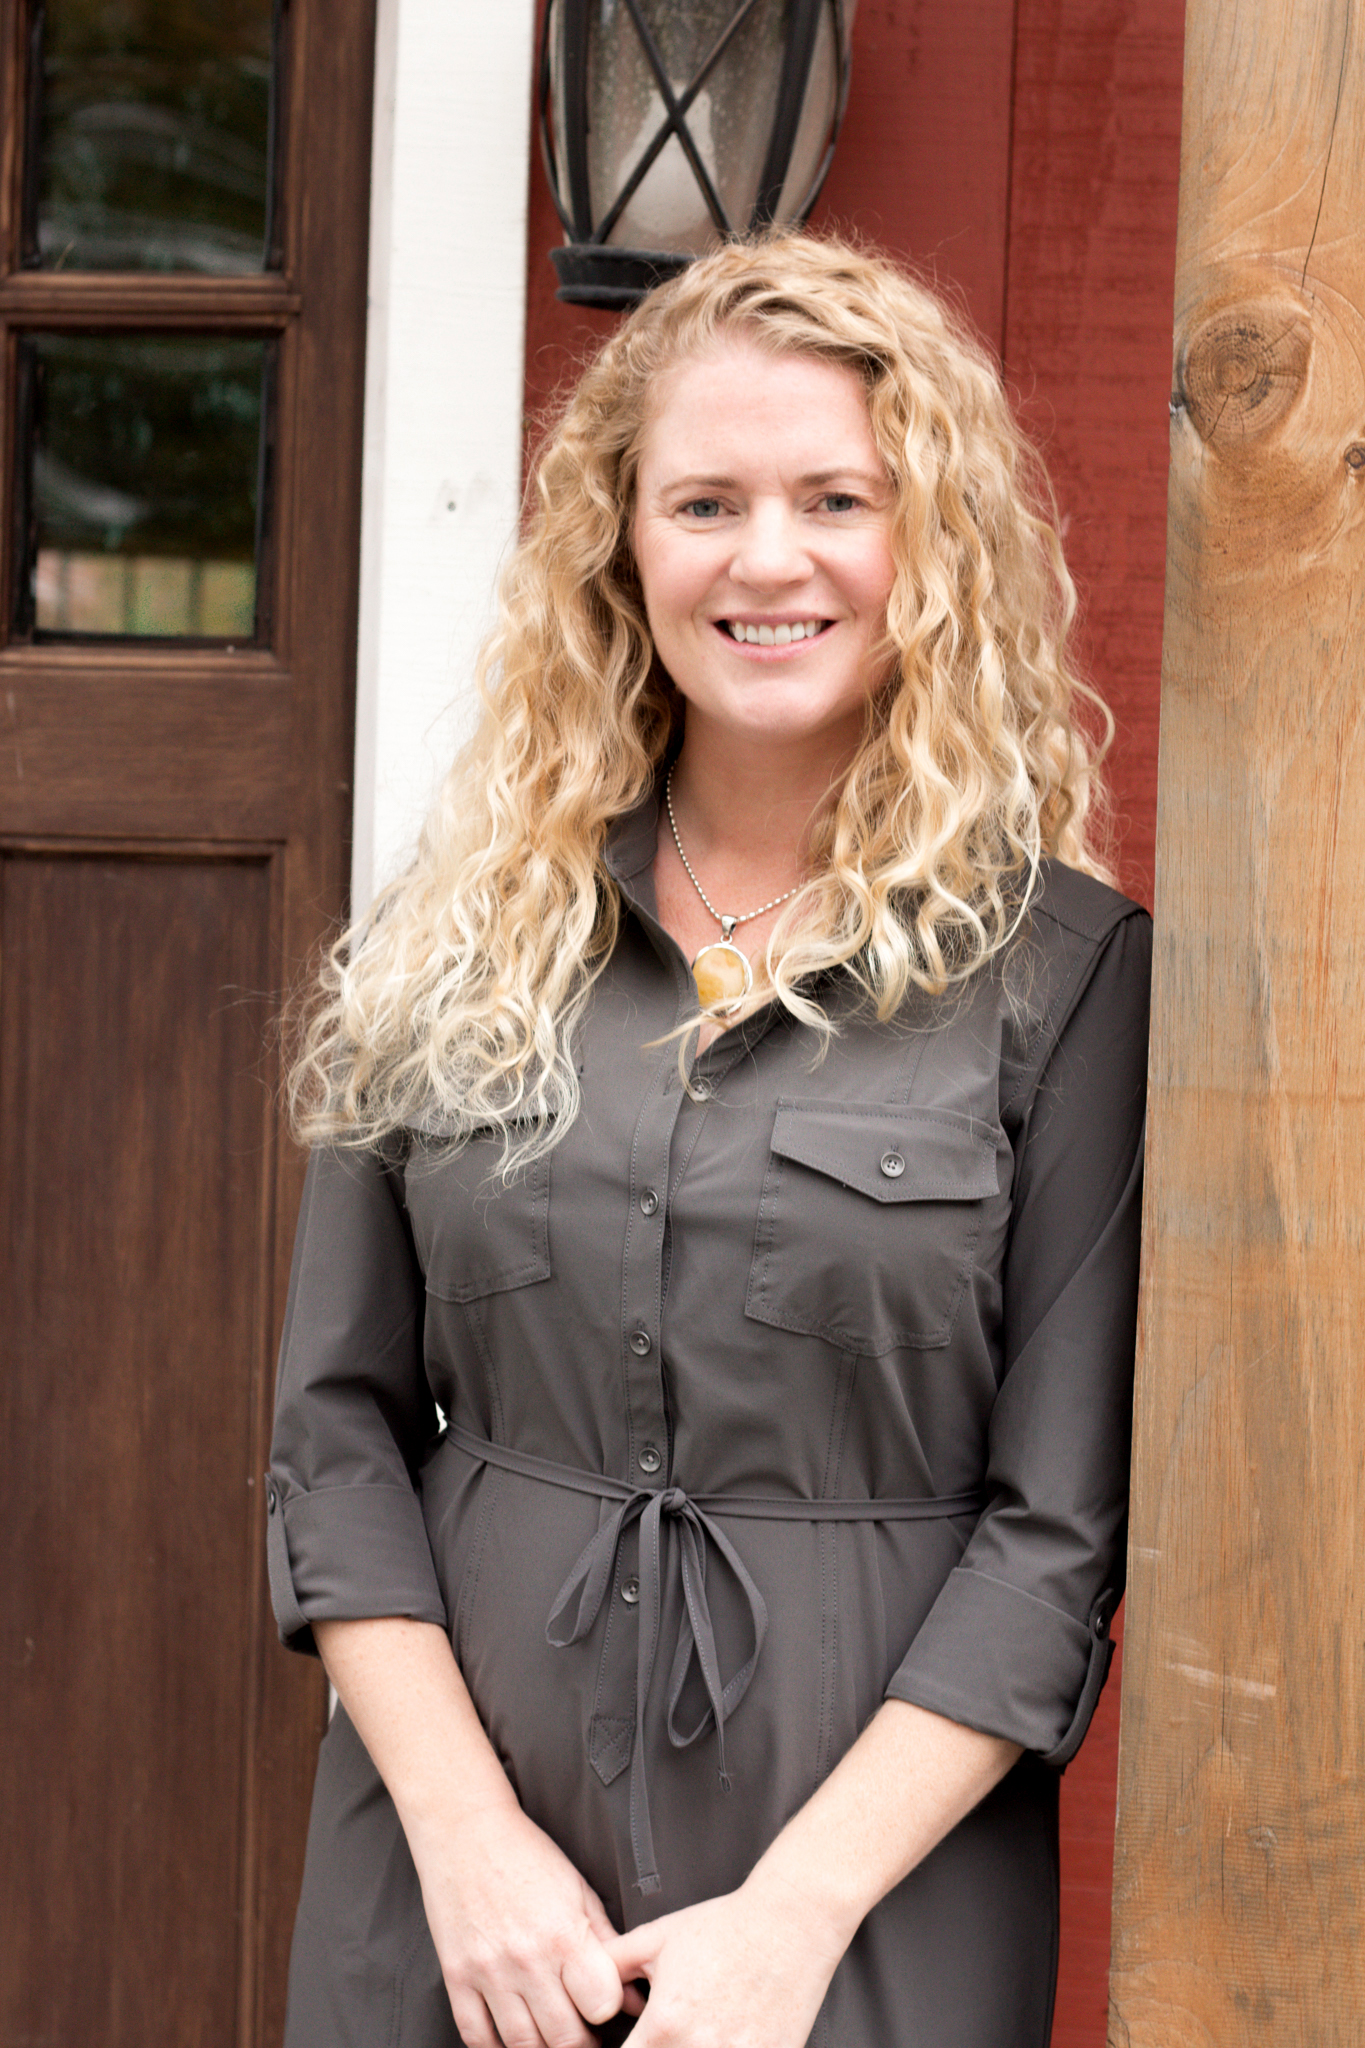 Jodie B. Fielding | AIA, NCARB